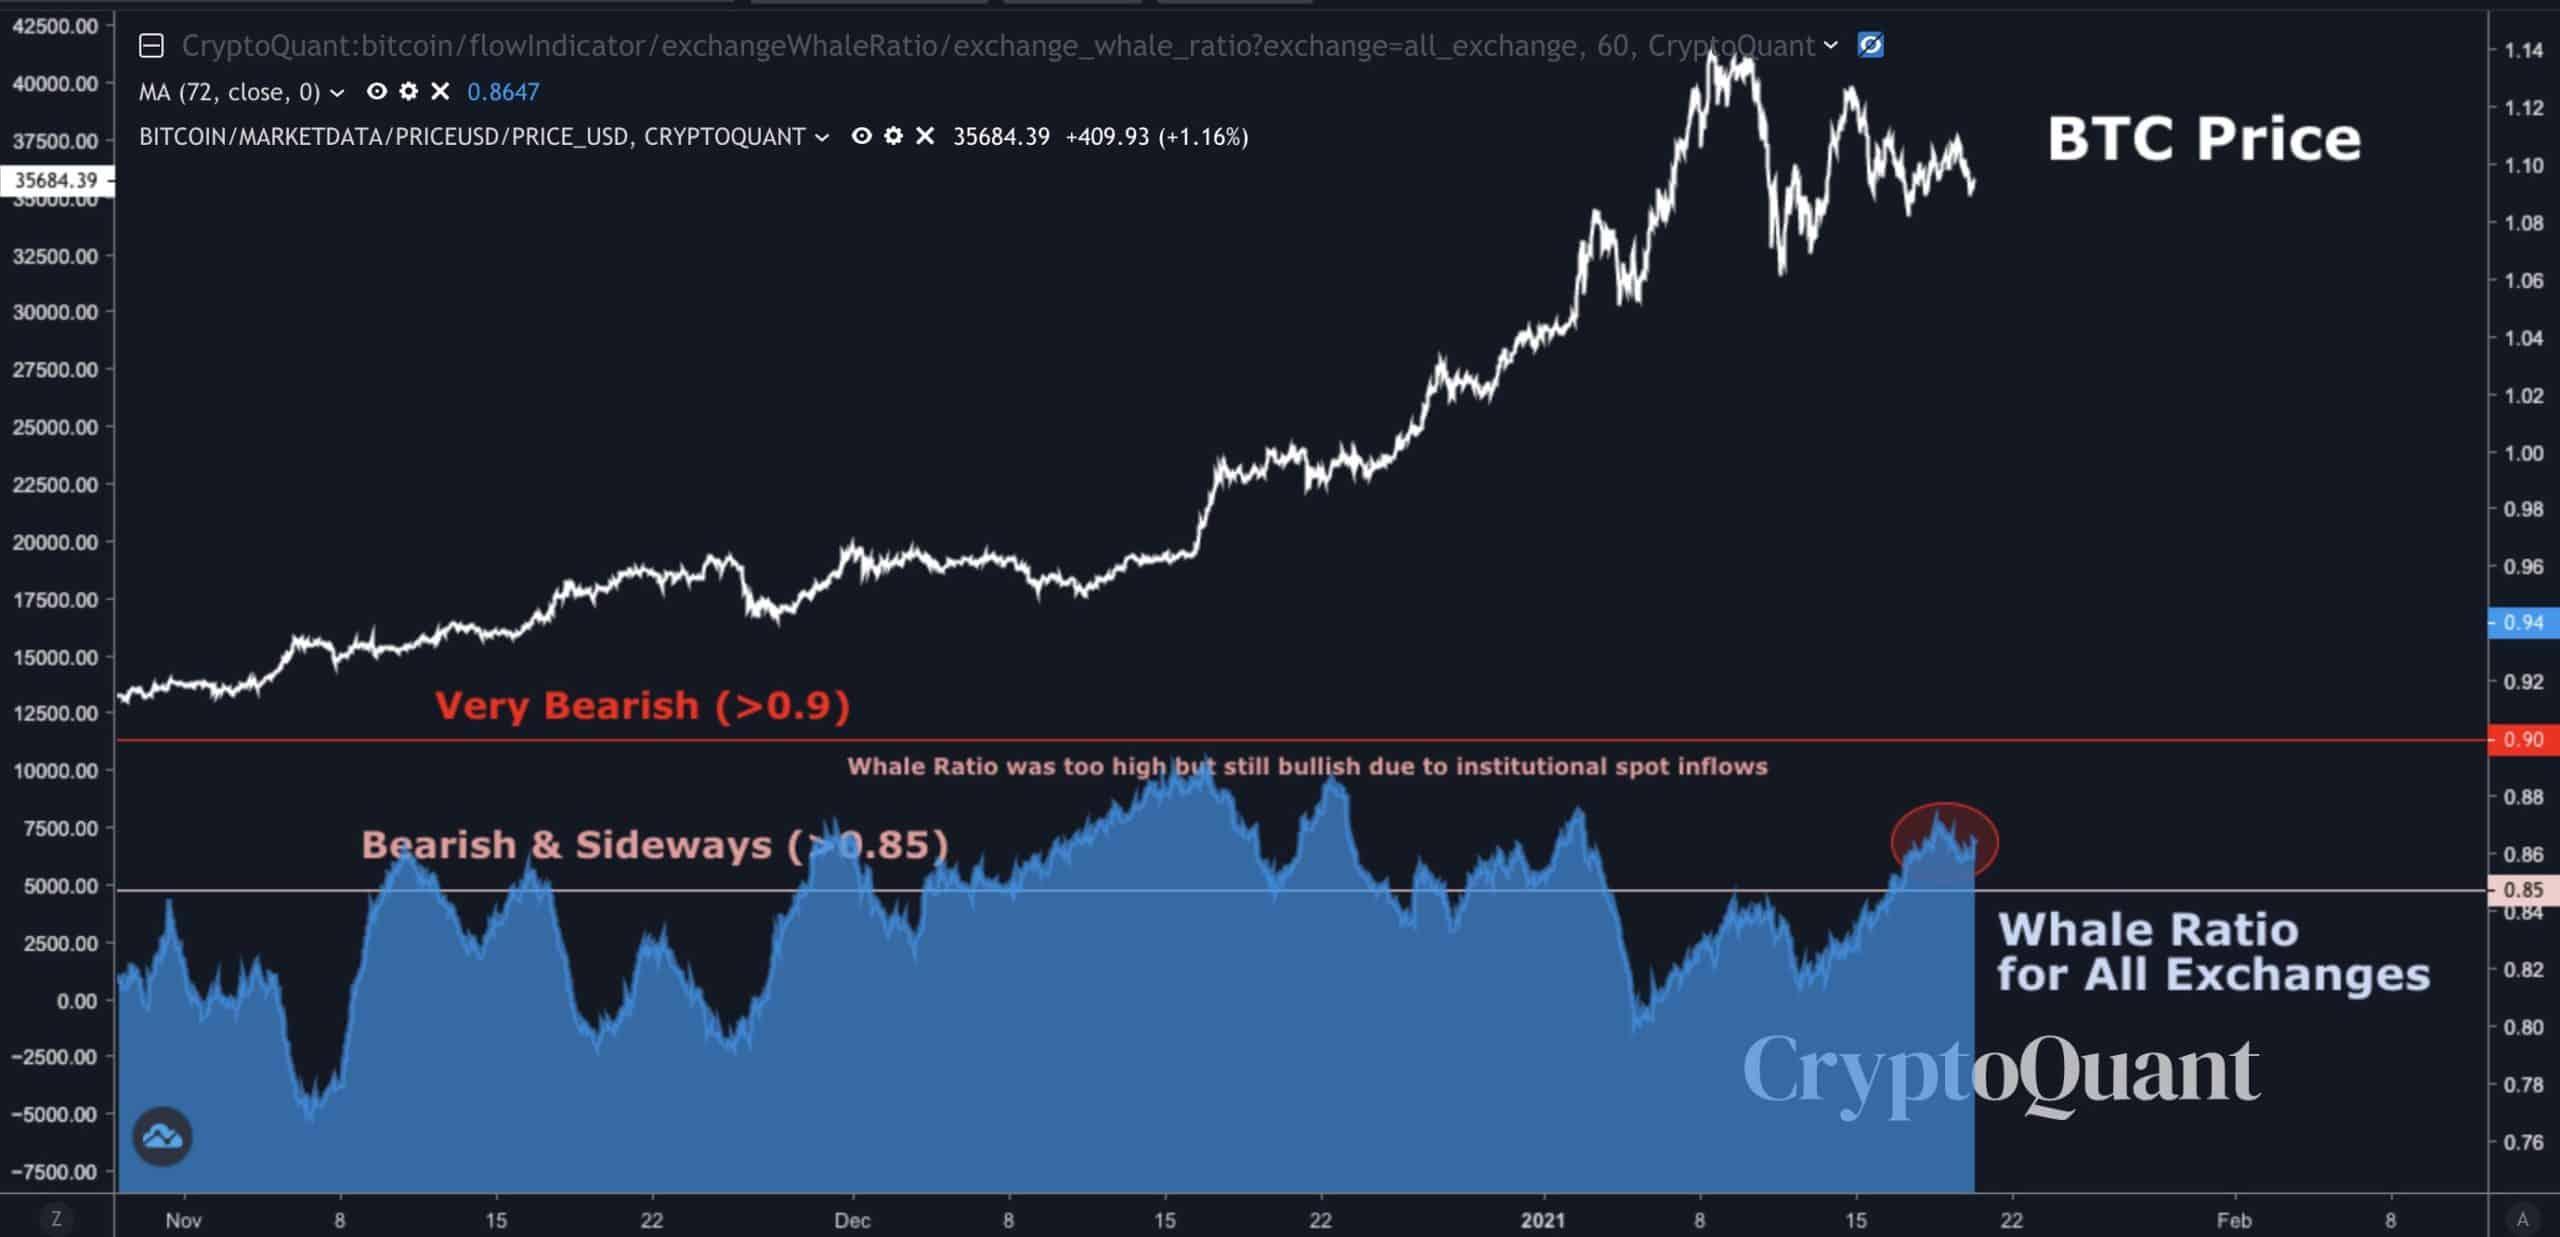 Bitcoin Price Vs. Whales' Behavior. Source: CryptoQuant